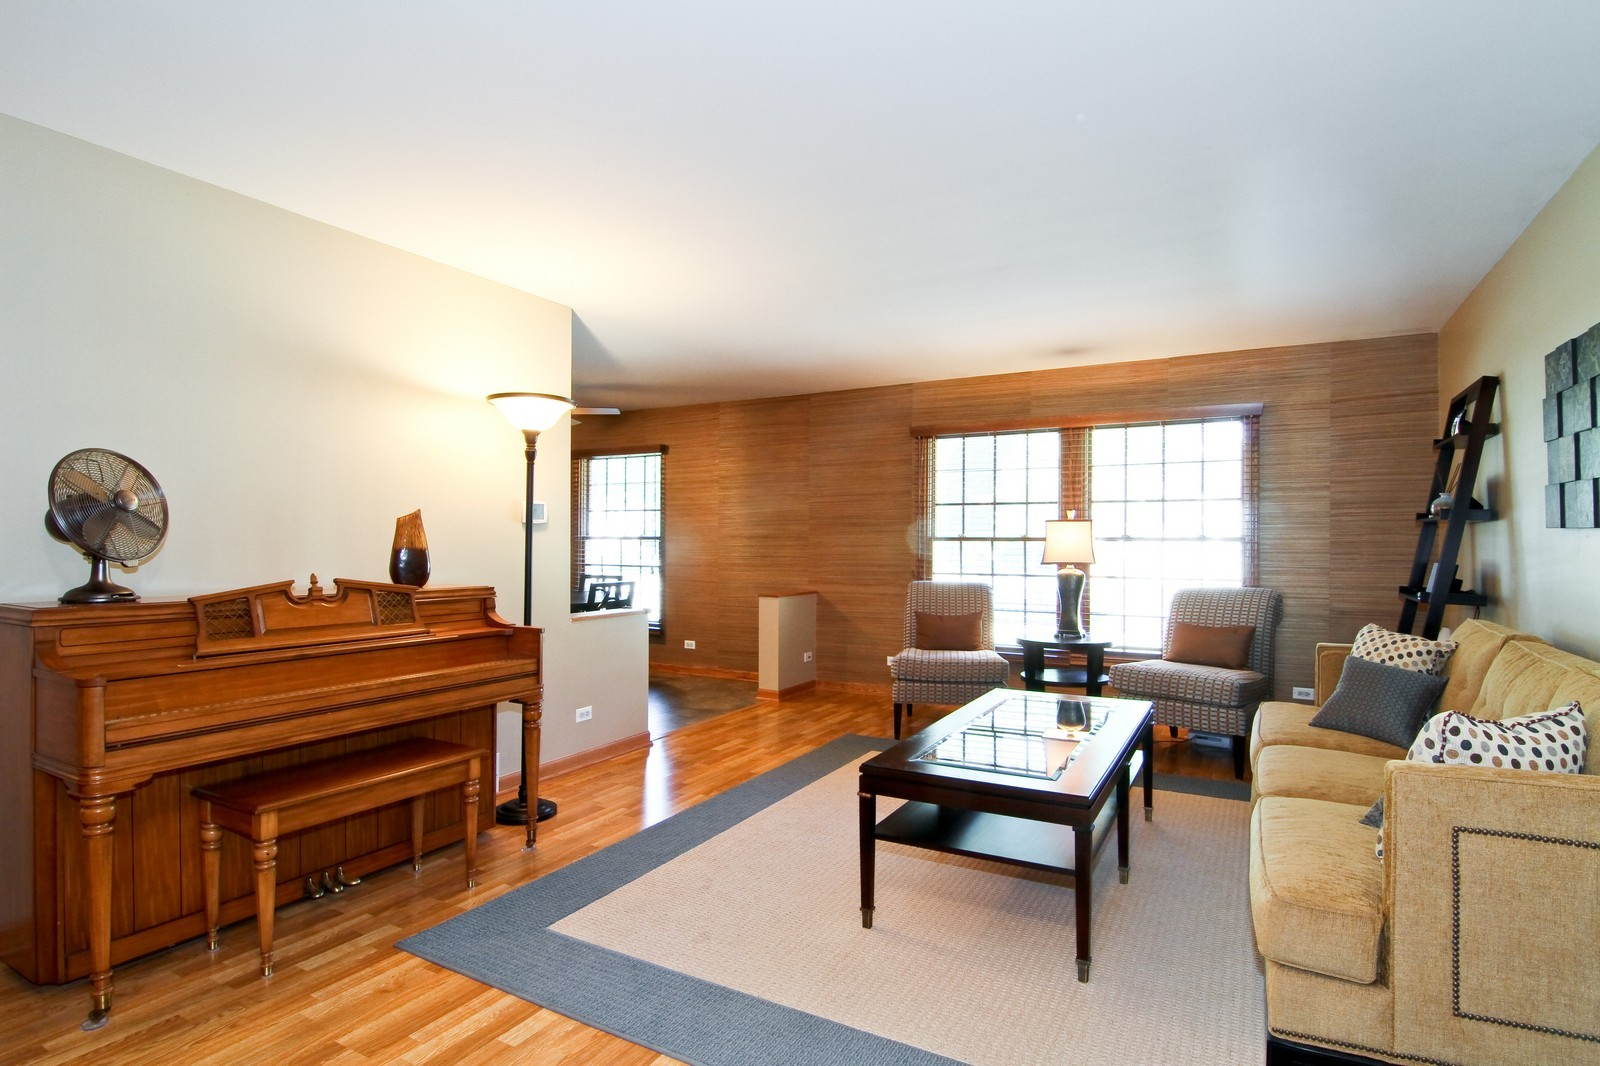 Real Estate Photography - 89 N Ott, Glen Ellyn, IL, 60137 - Living Room